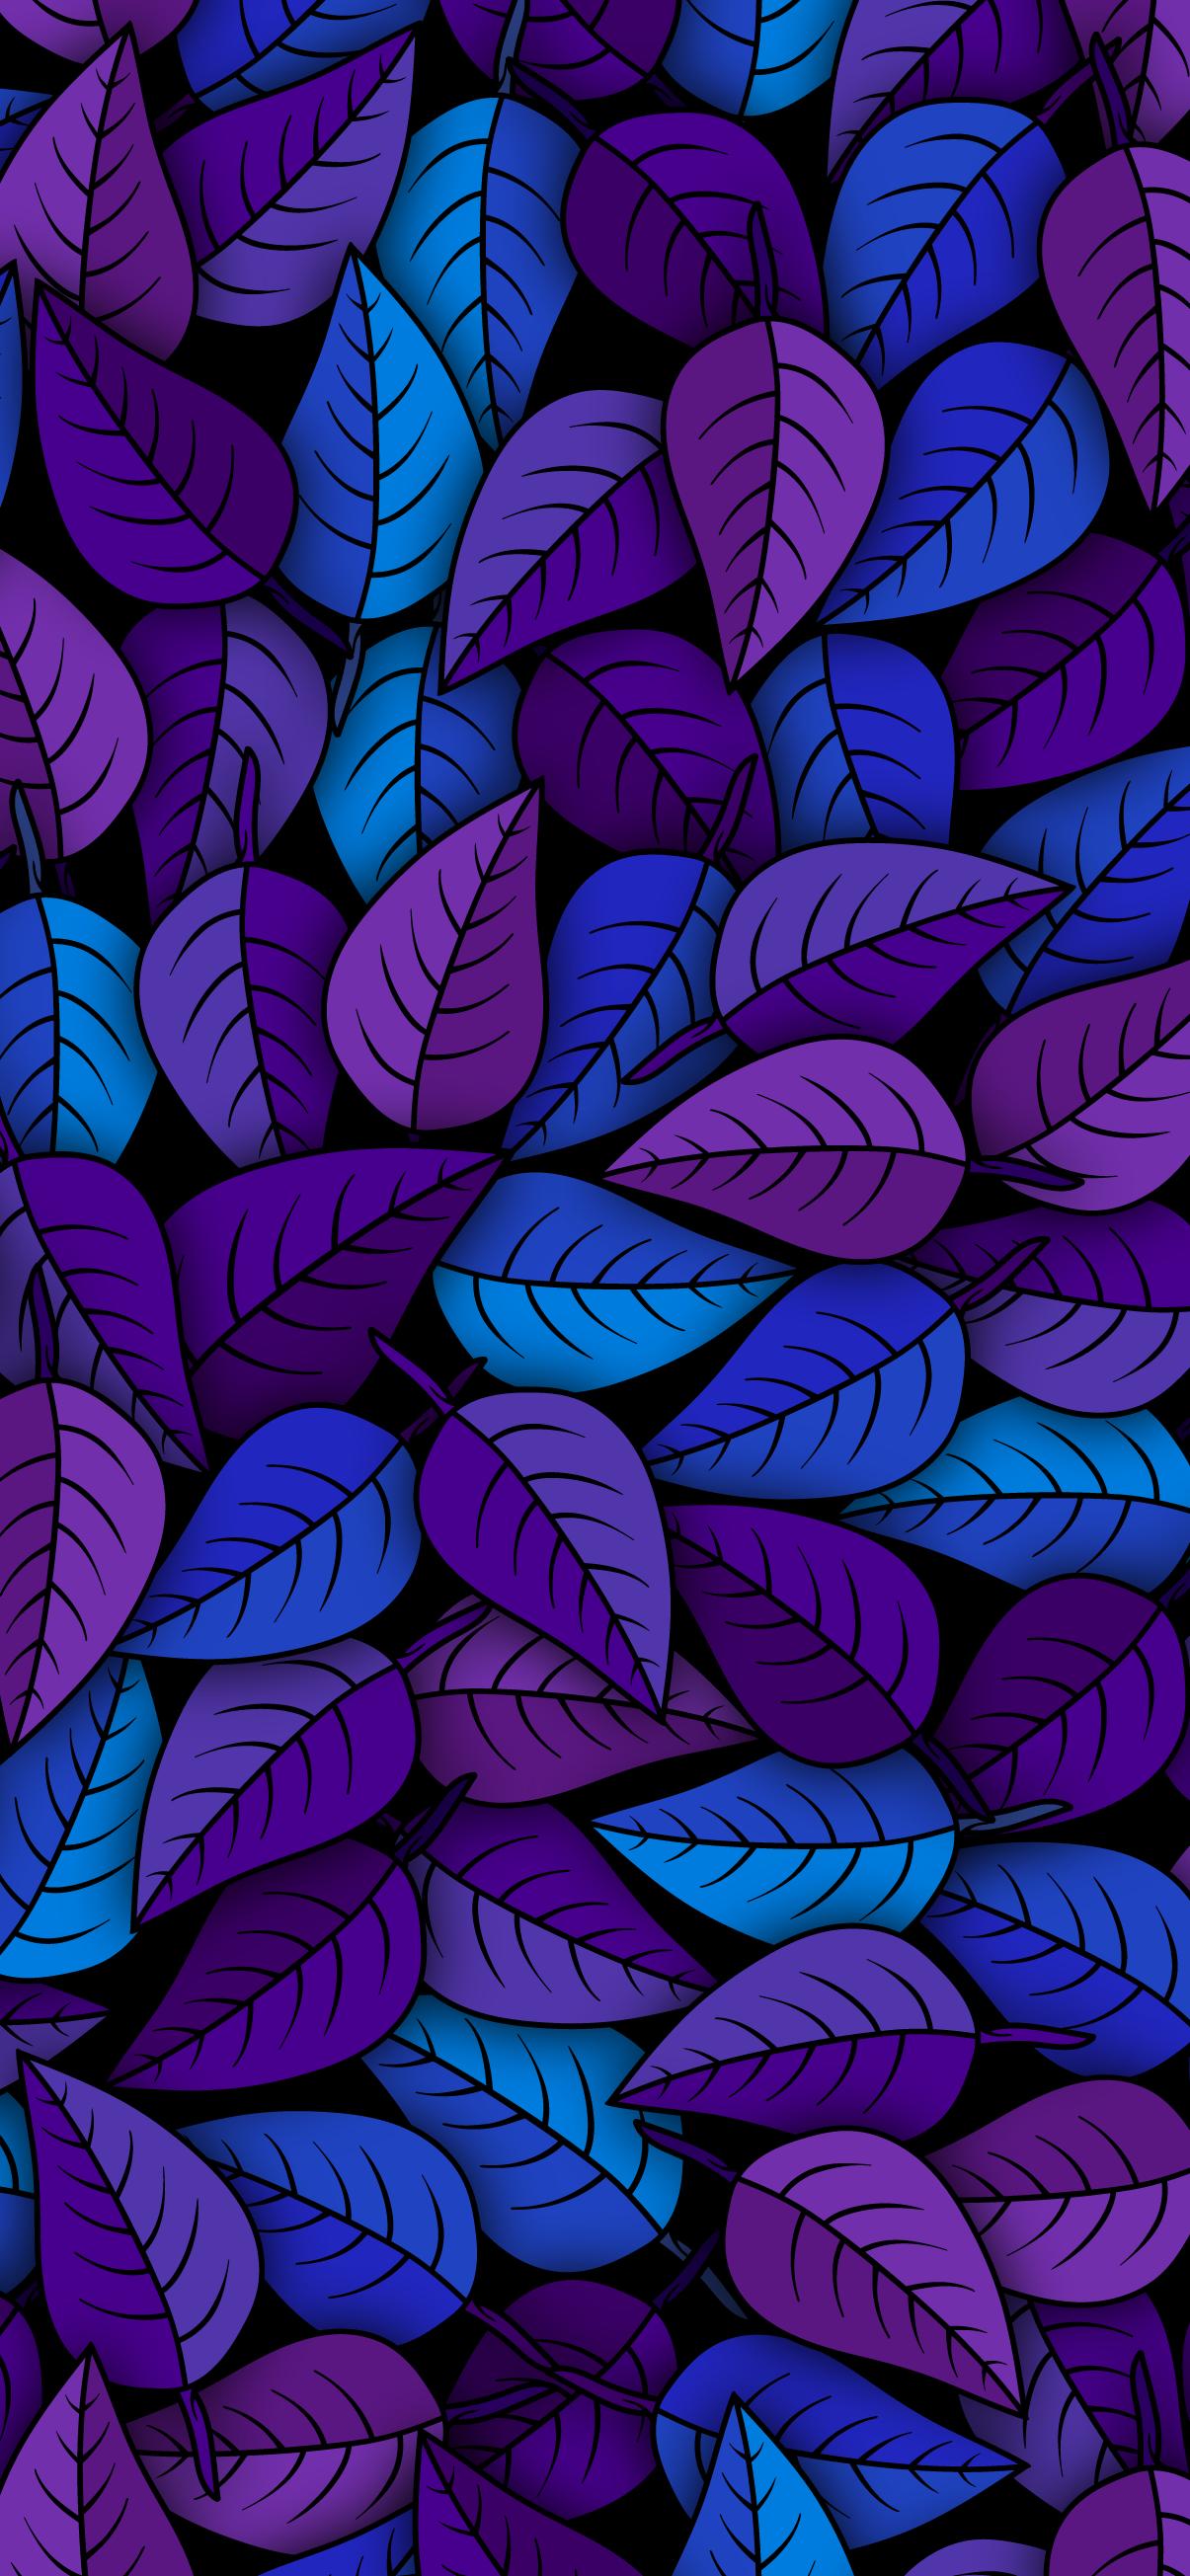 LEAF PATTERN FOLIAGE BLUE PURPLE aesthetic